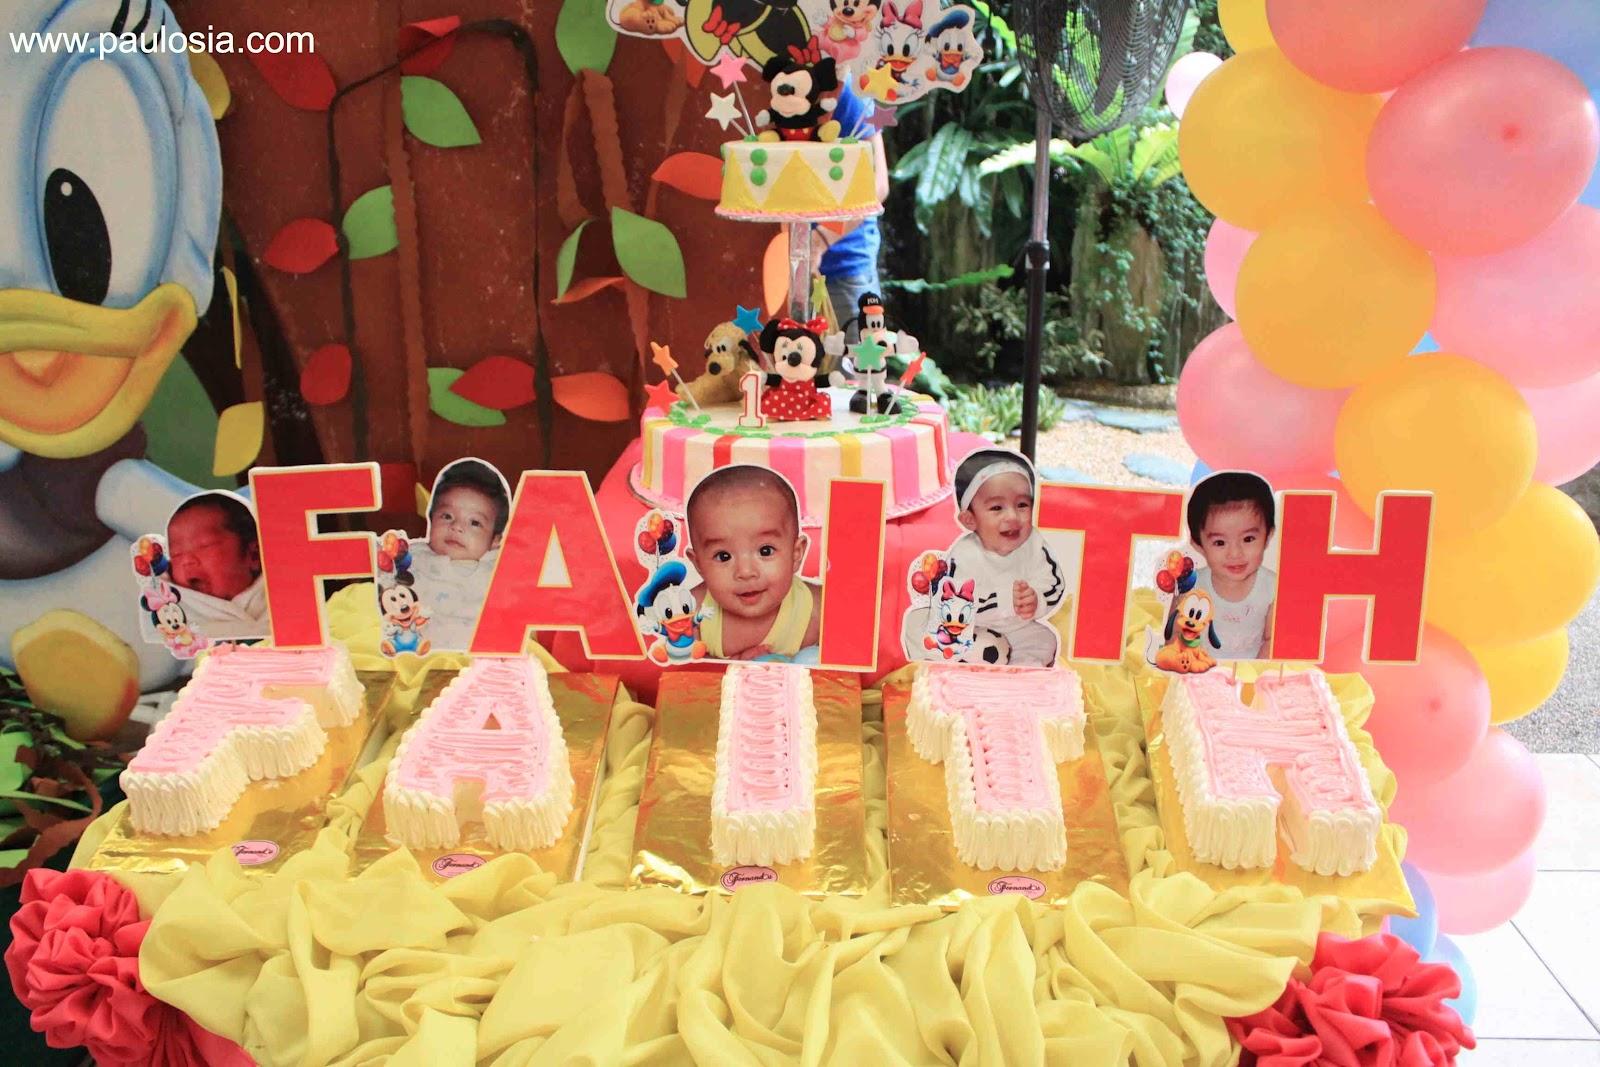 KIDDIE PARTY PHOTOGRAPHER PHILIPPINES PHOTOBOOTH PHILIPPINES